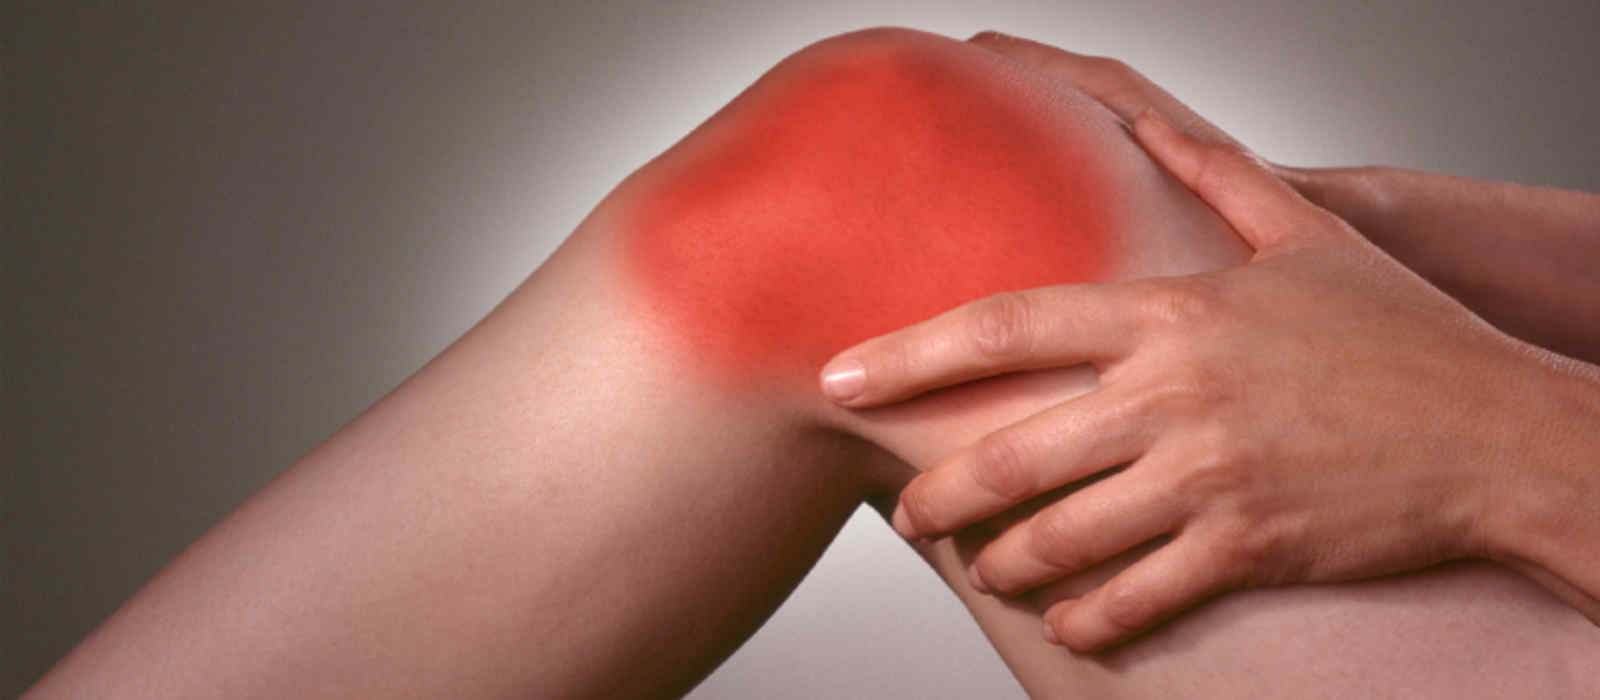 Knieprobleme: Das Kreuz mit dem Knie | Personalfitness